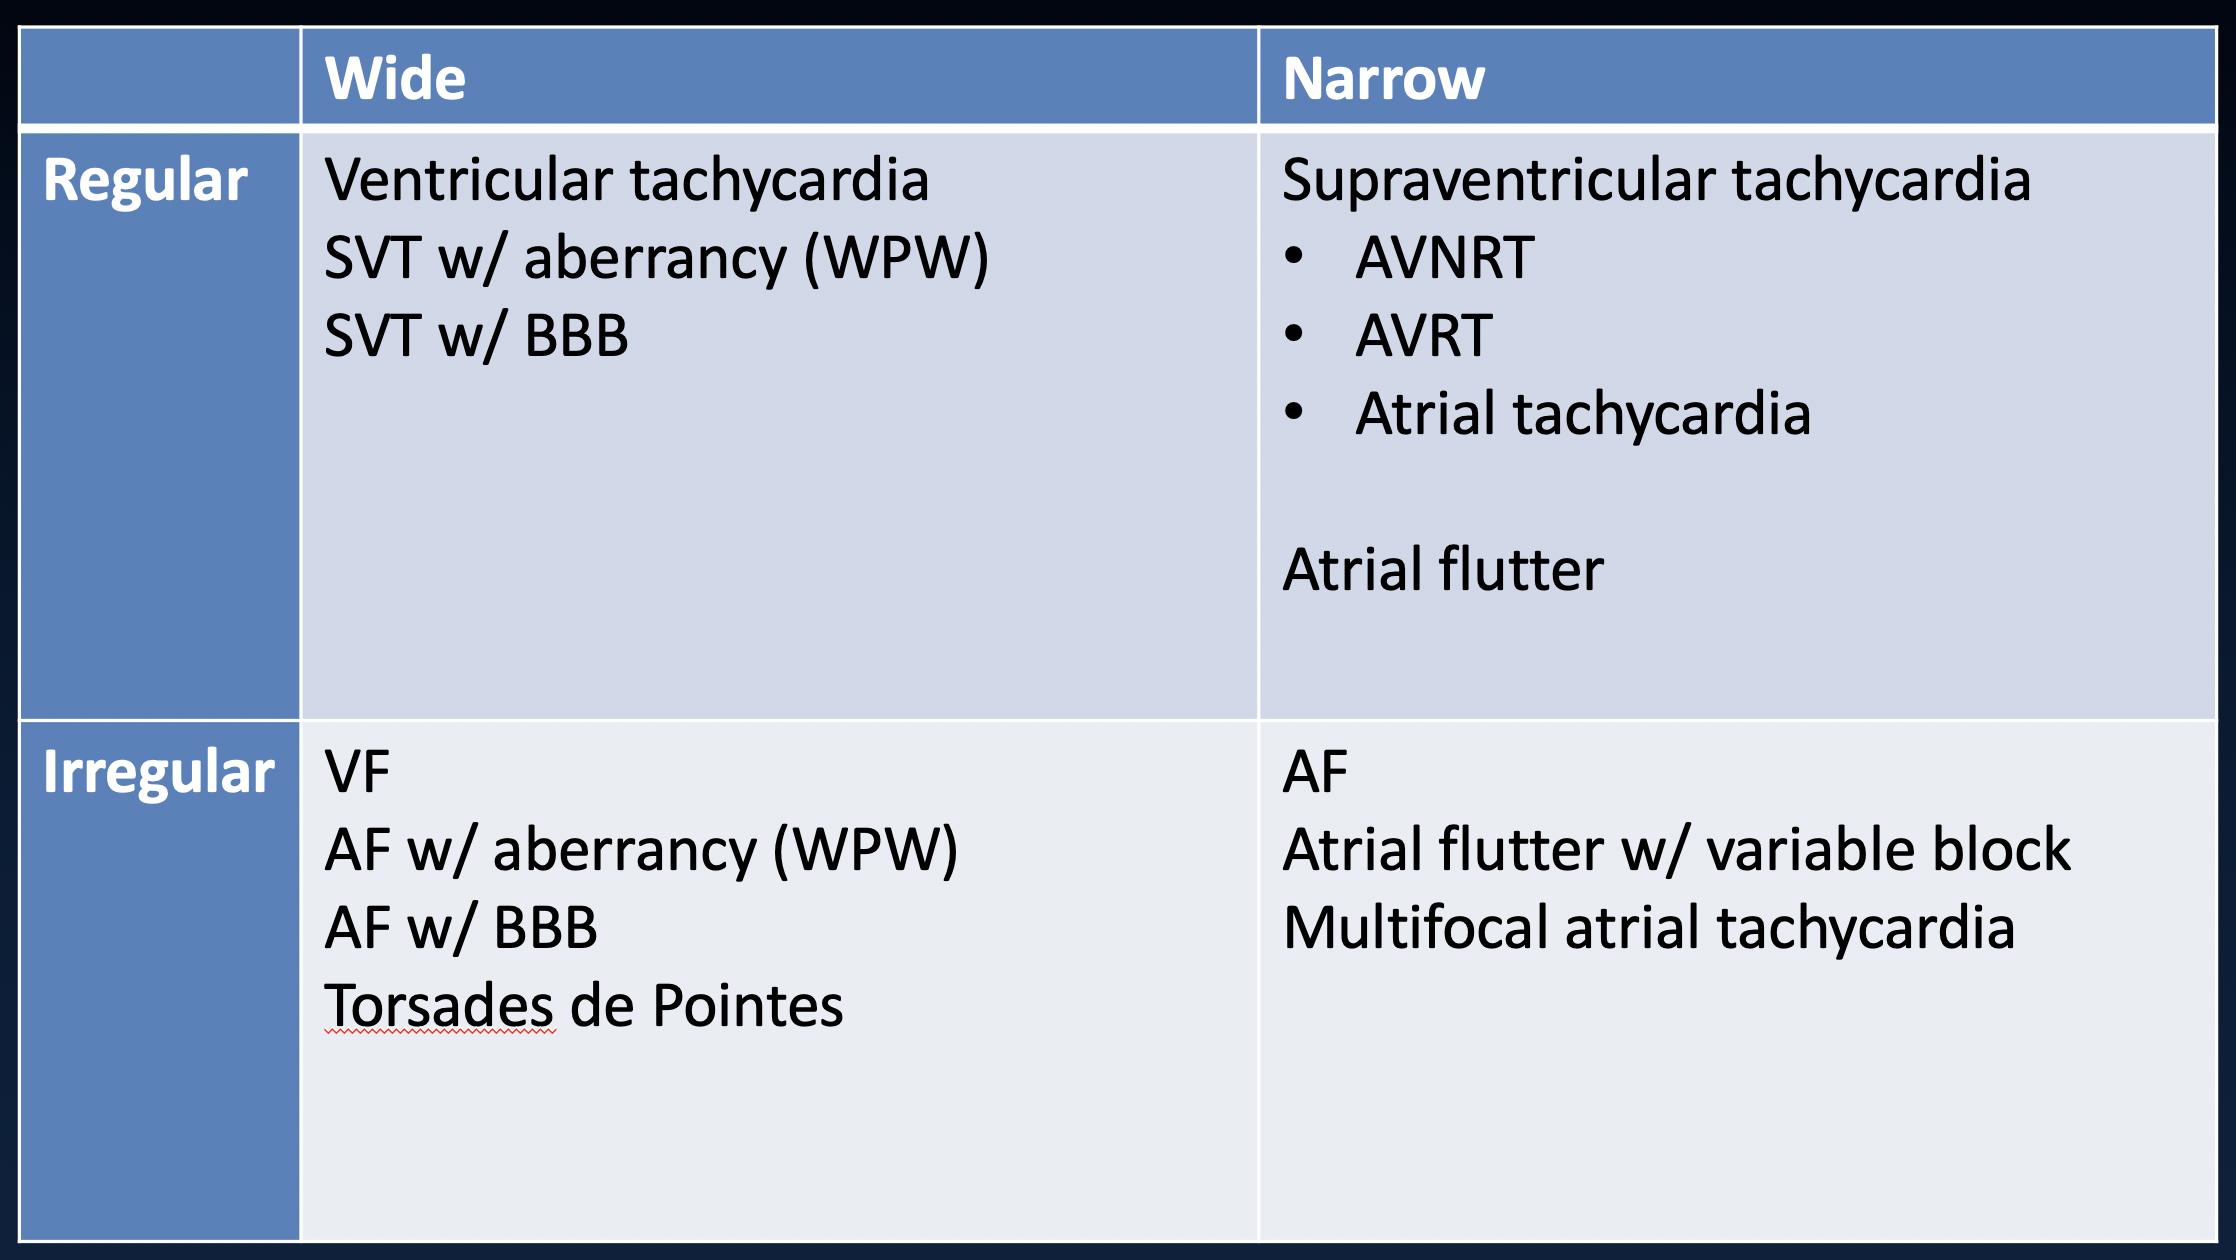 Cardiology Institute - ECG - Tachycardia Approach Regular Irregular Wide Narrow.png